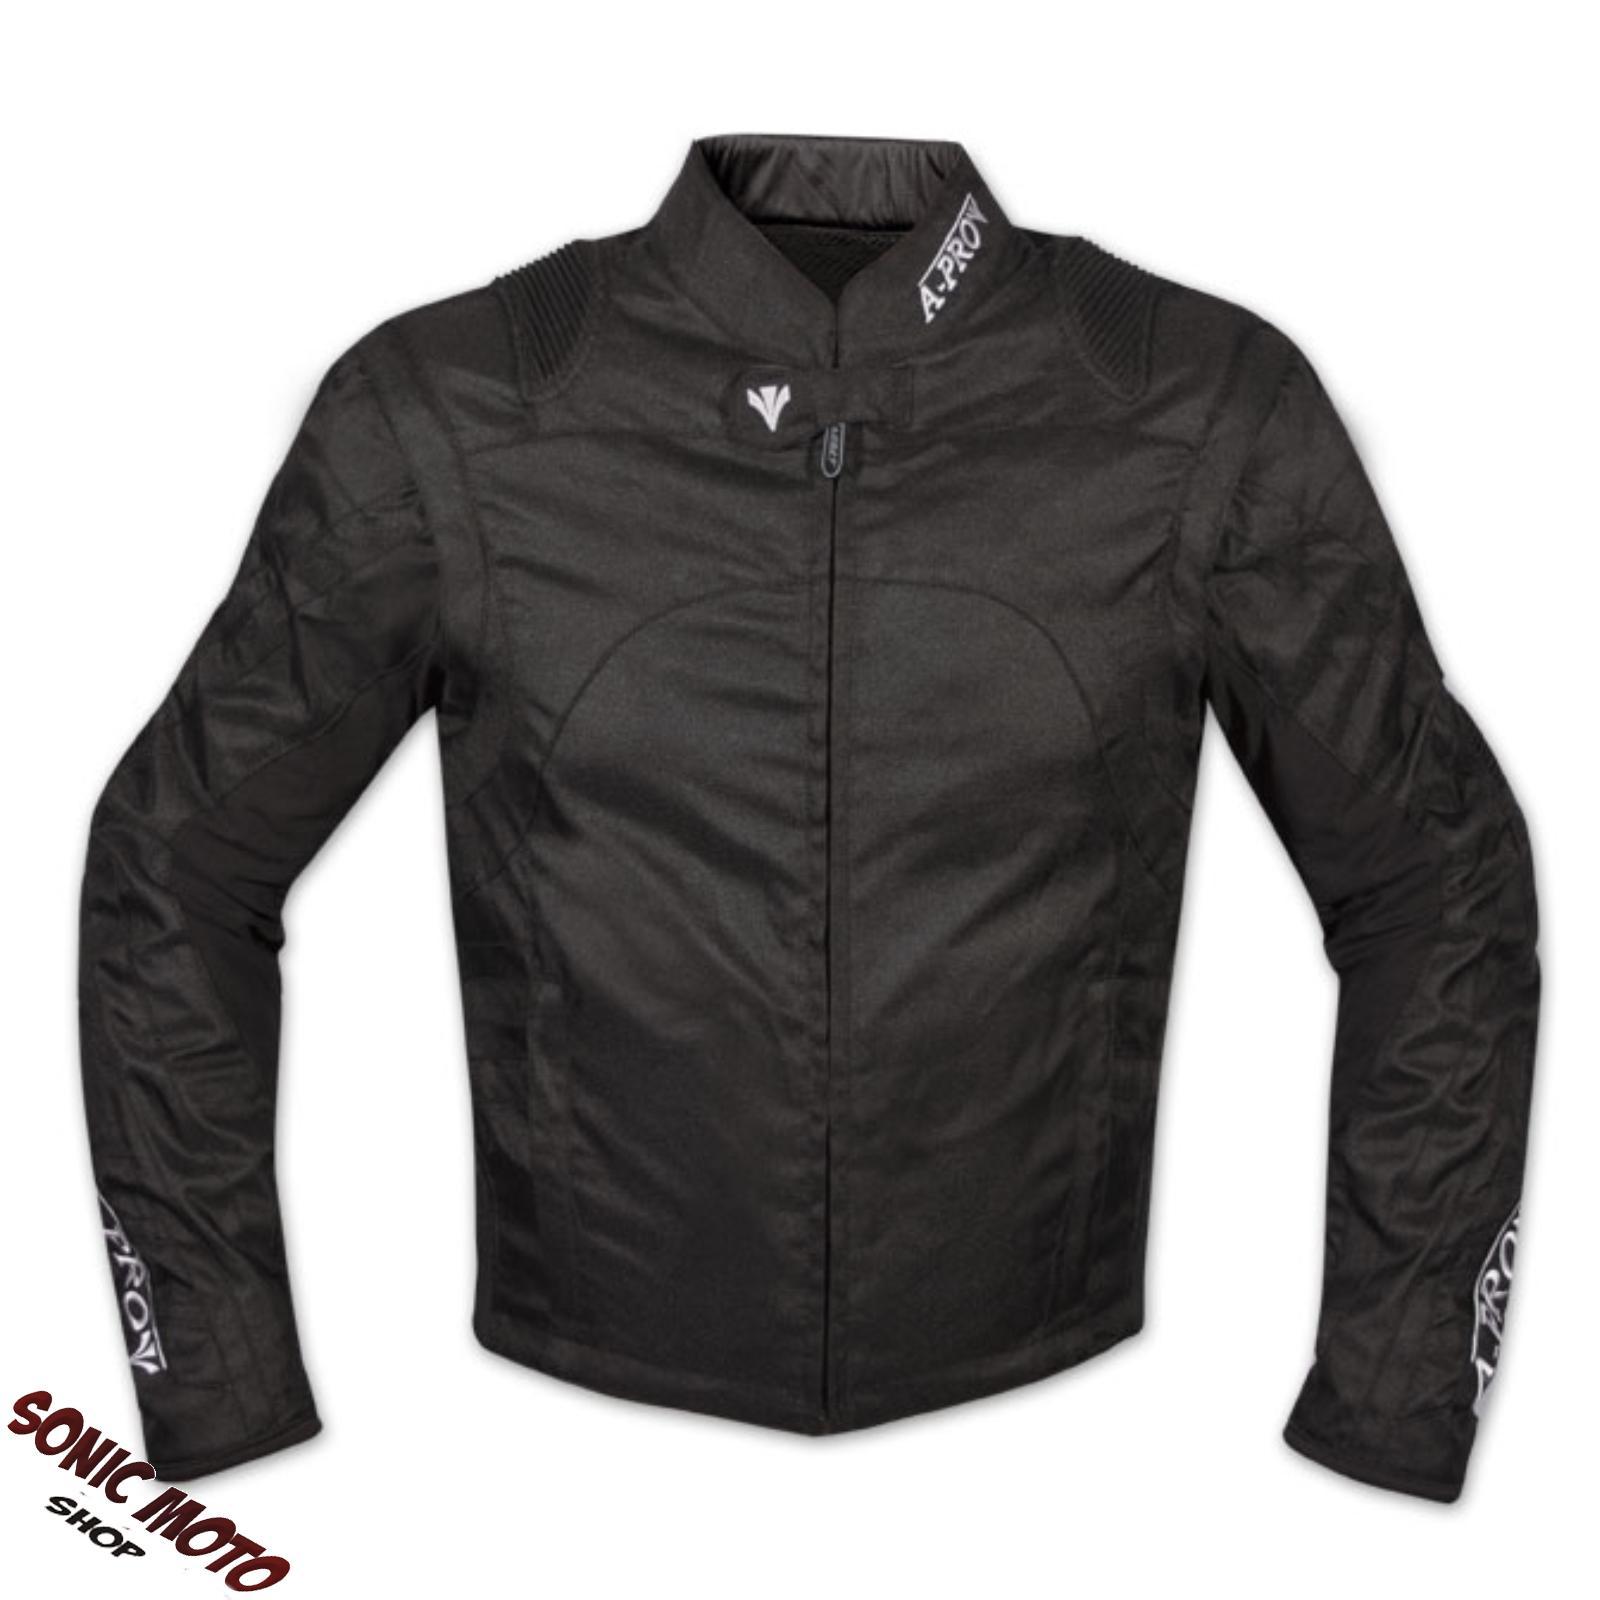 blouson tissu haute resistance protections motard moto touring et ebay. Black Bedroom Furniture Sets. Home Design Ideas